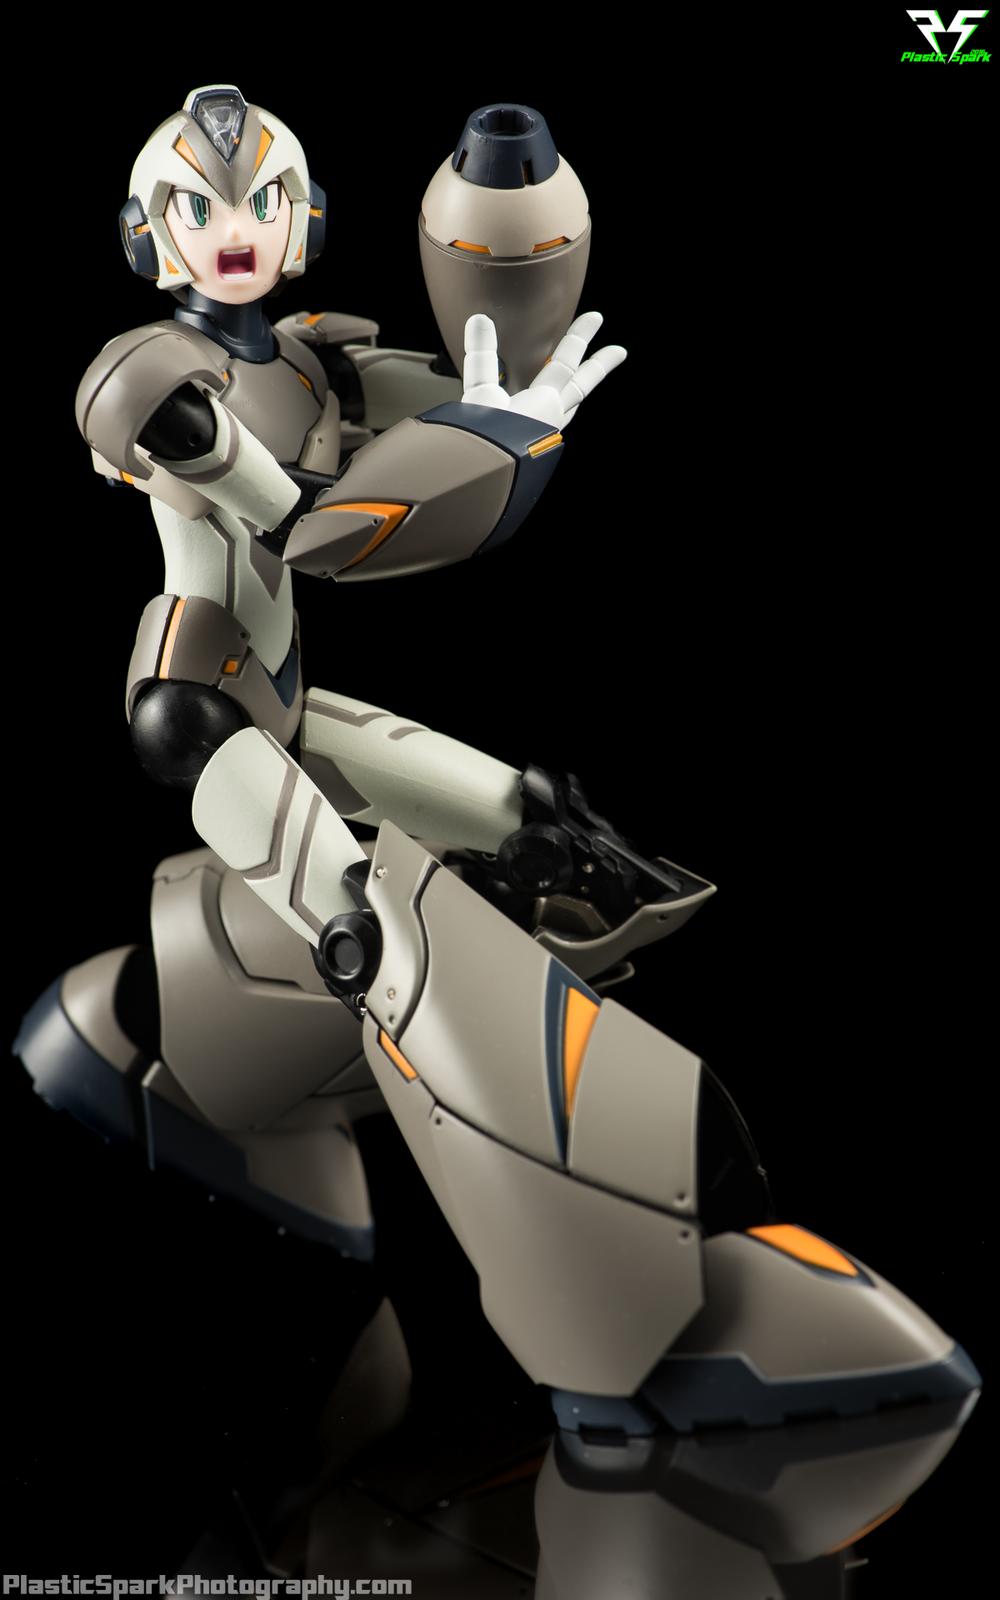 Truforce-Megaman-X-KS-Variant-(3-of-9).png